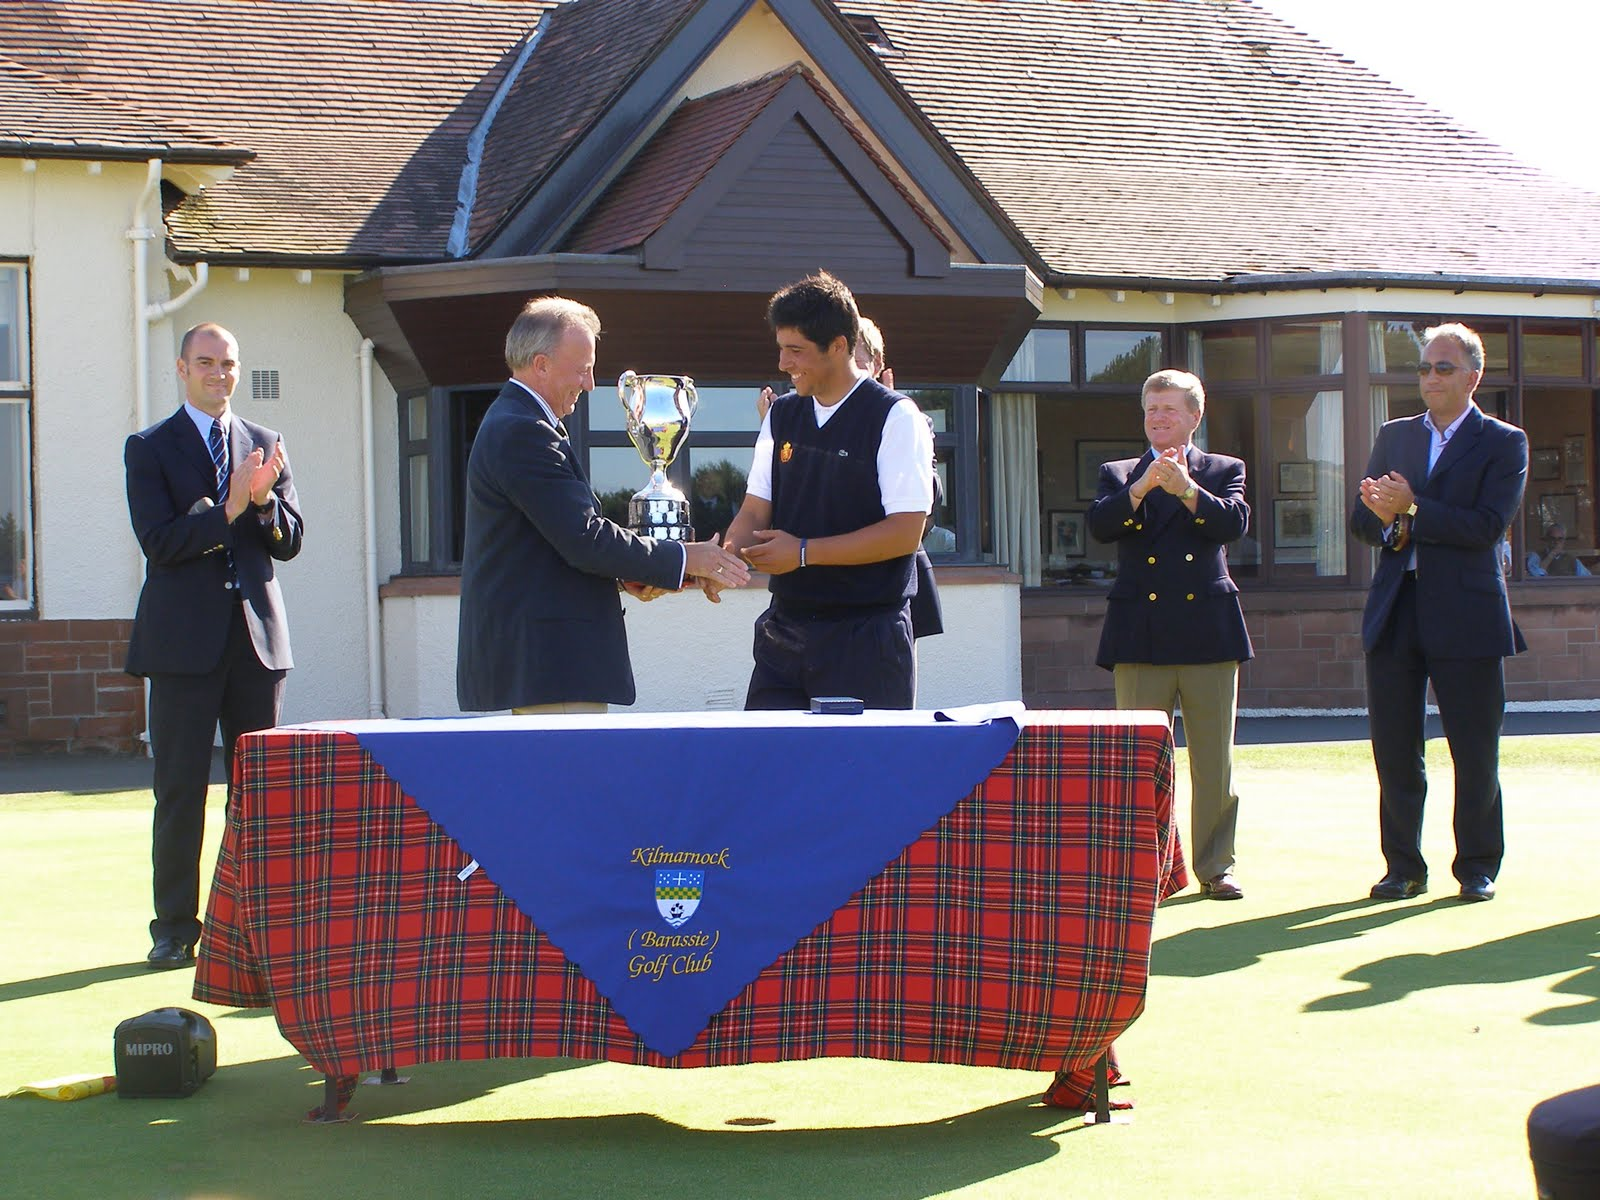 David Miller, Captain of Kilmarnock Barassie Golf Club, presents Adrian ...